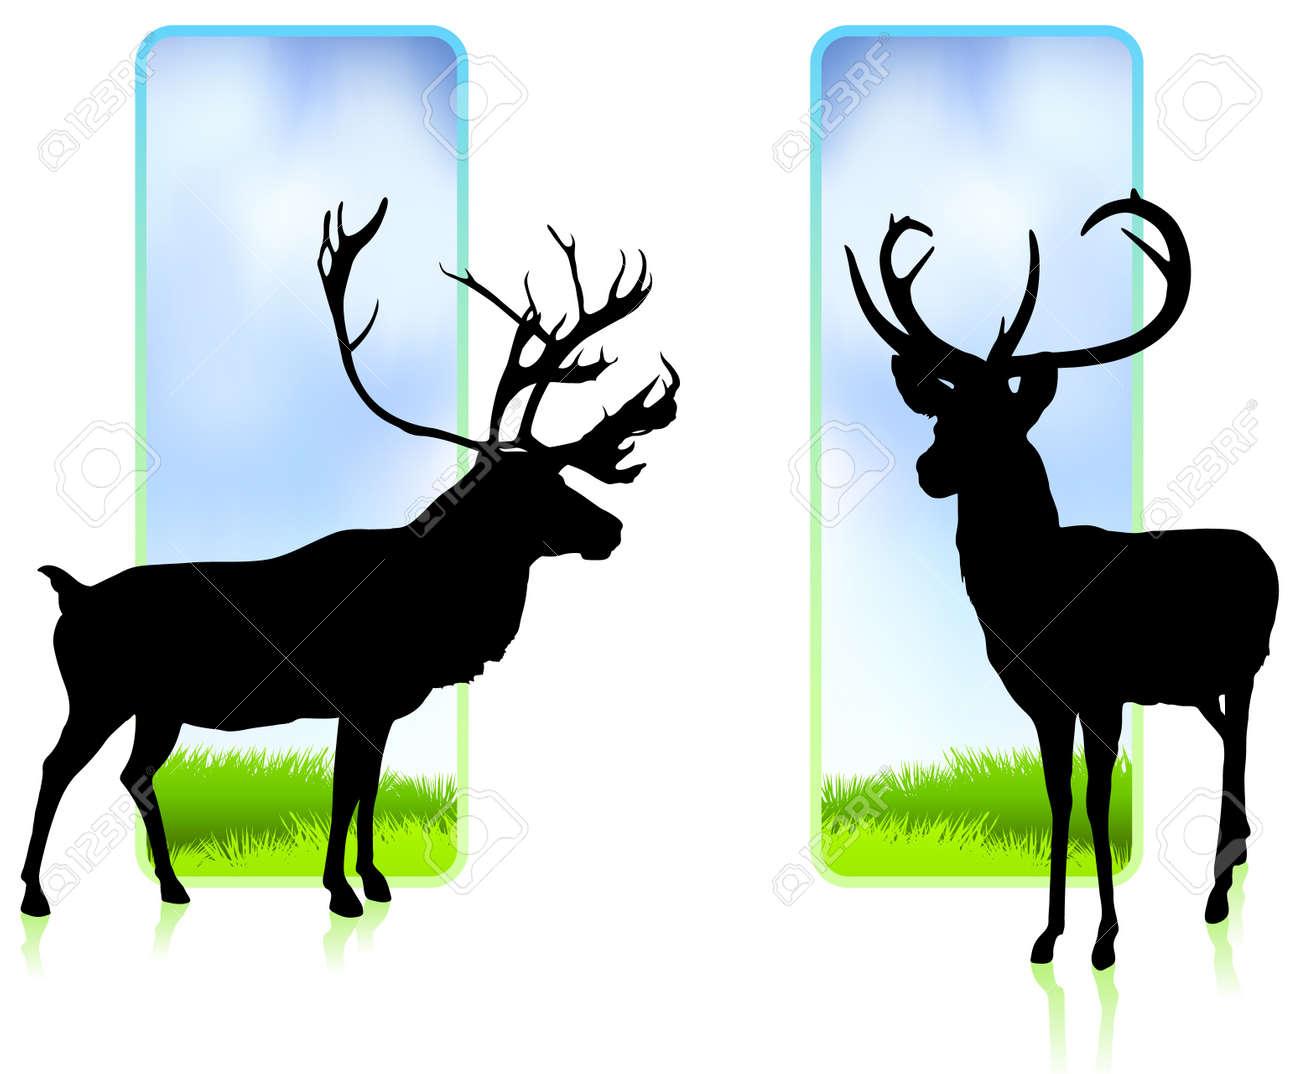 Deer with Nature BannersOriginal Vector Illustration Stock Vector - 20476480